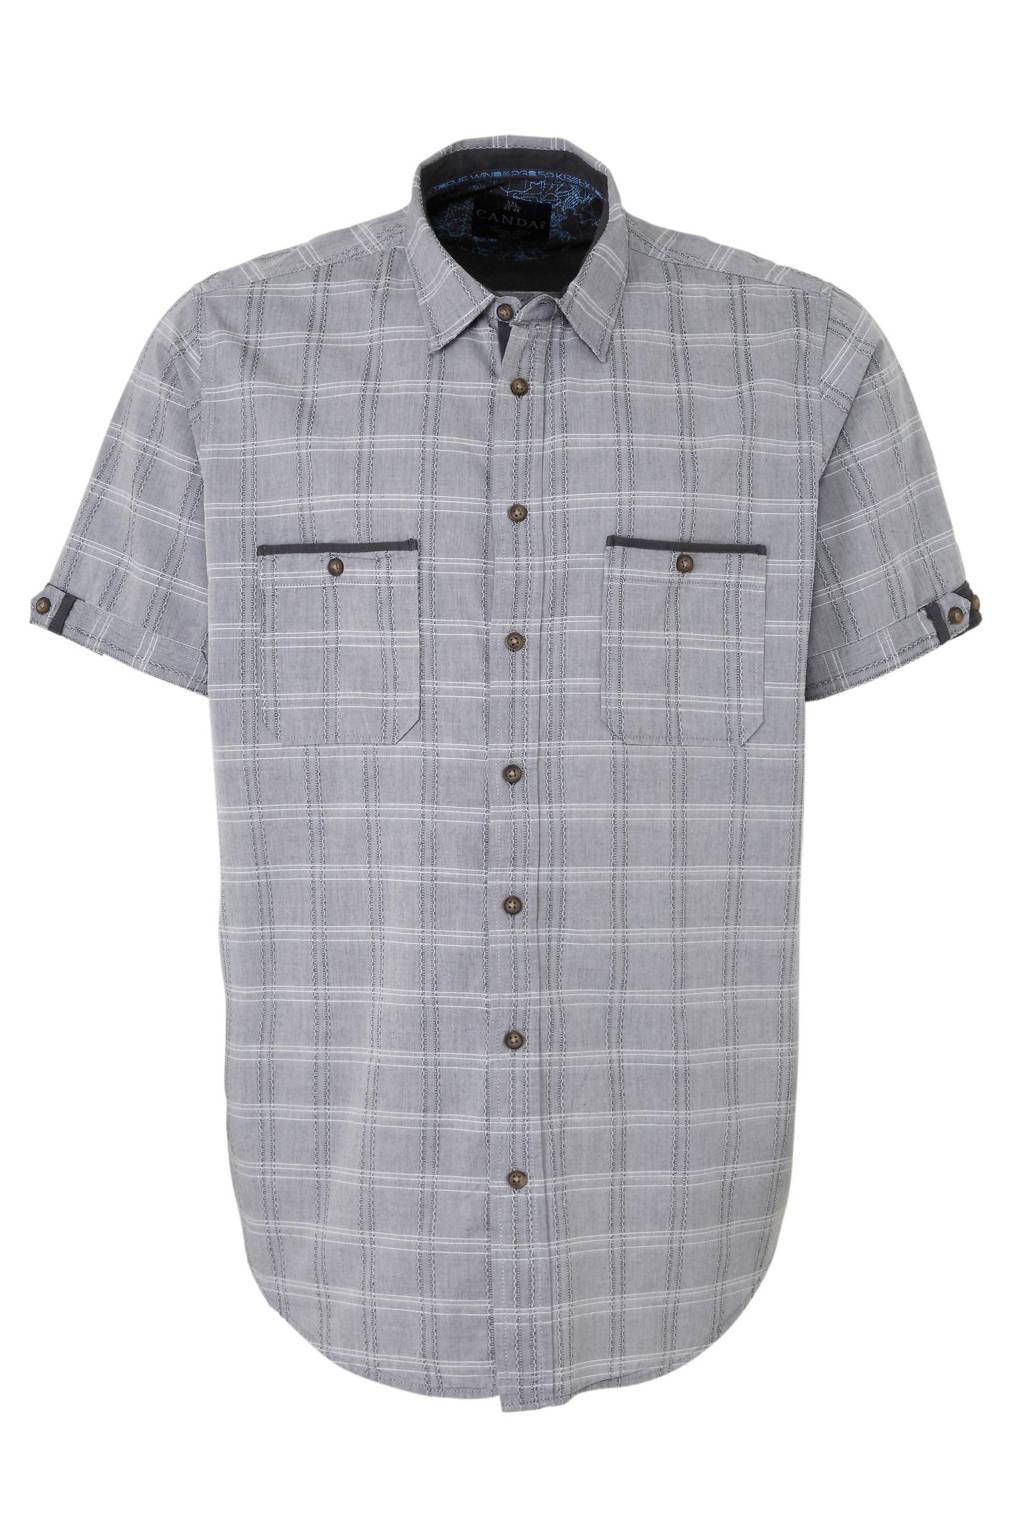 C&A XL Canda overhemd met all over print grijs, Grijs